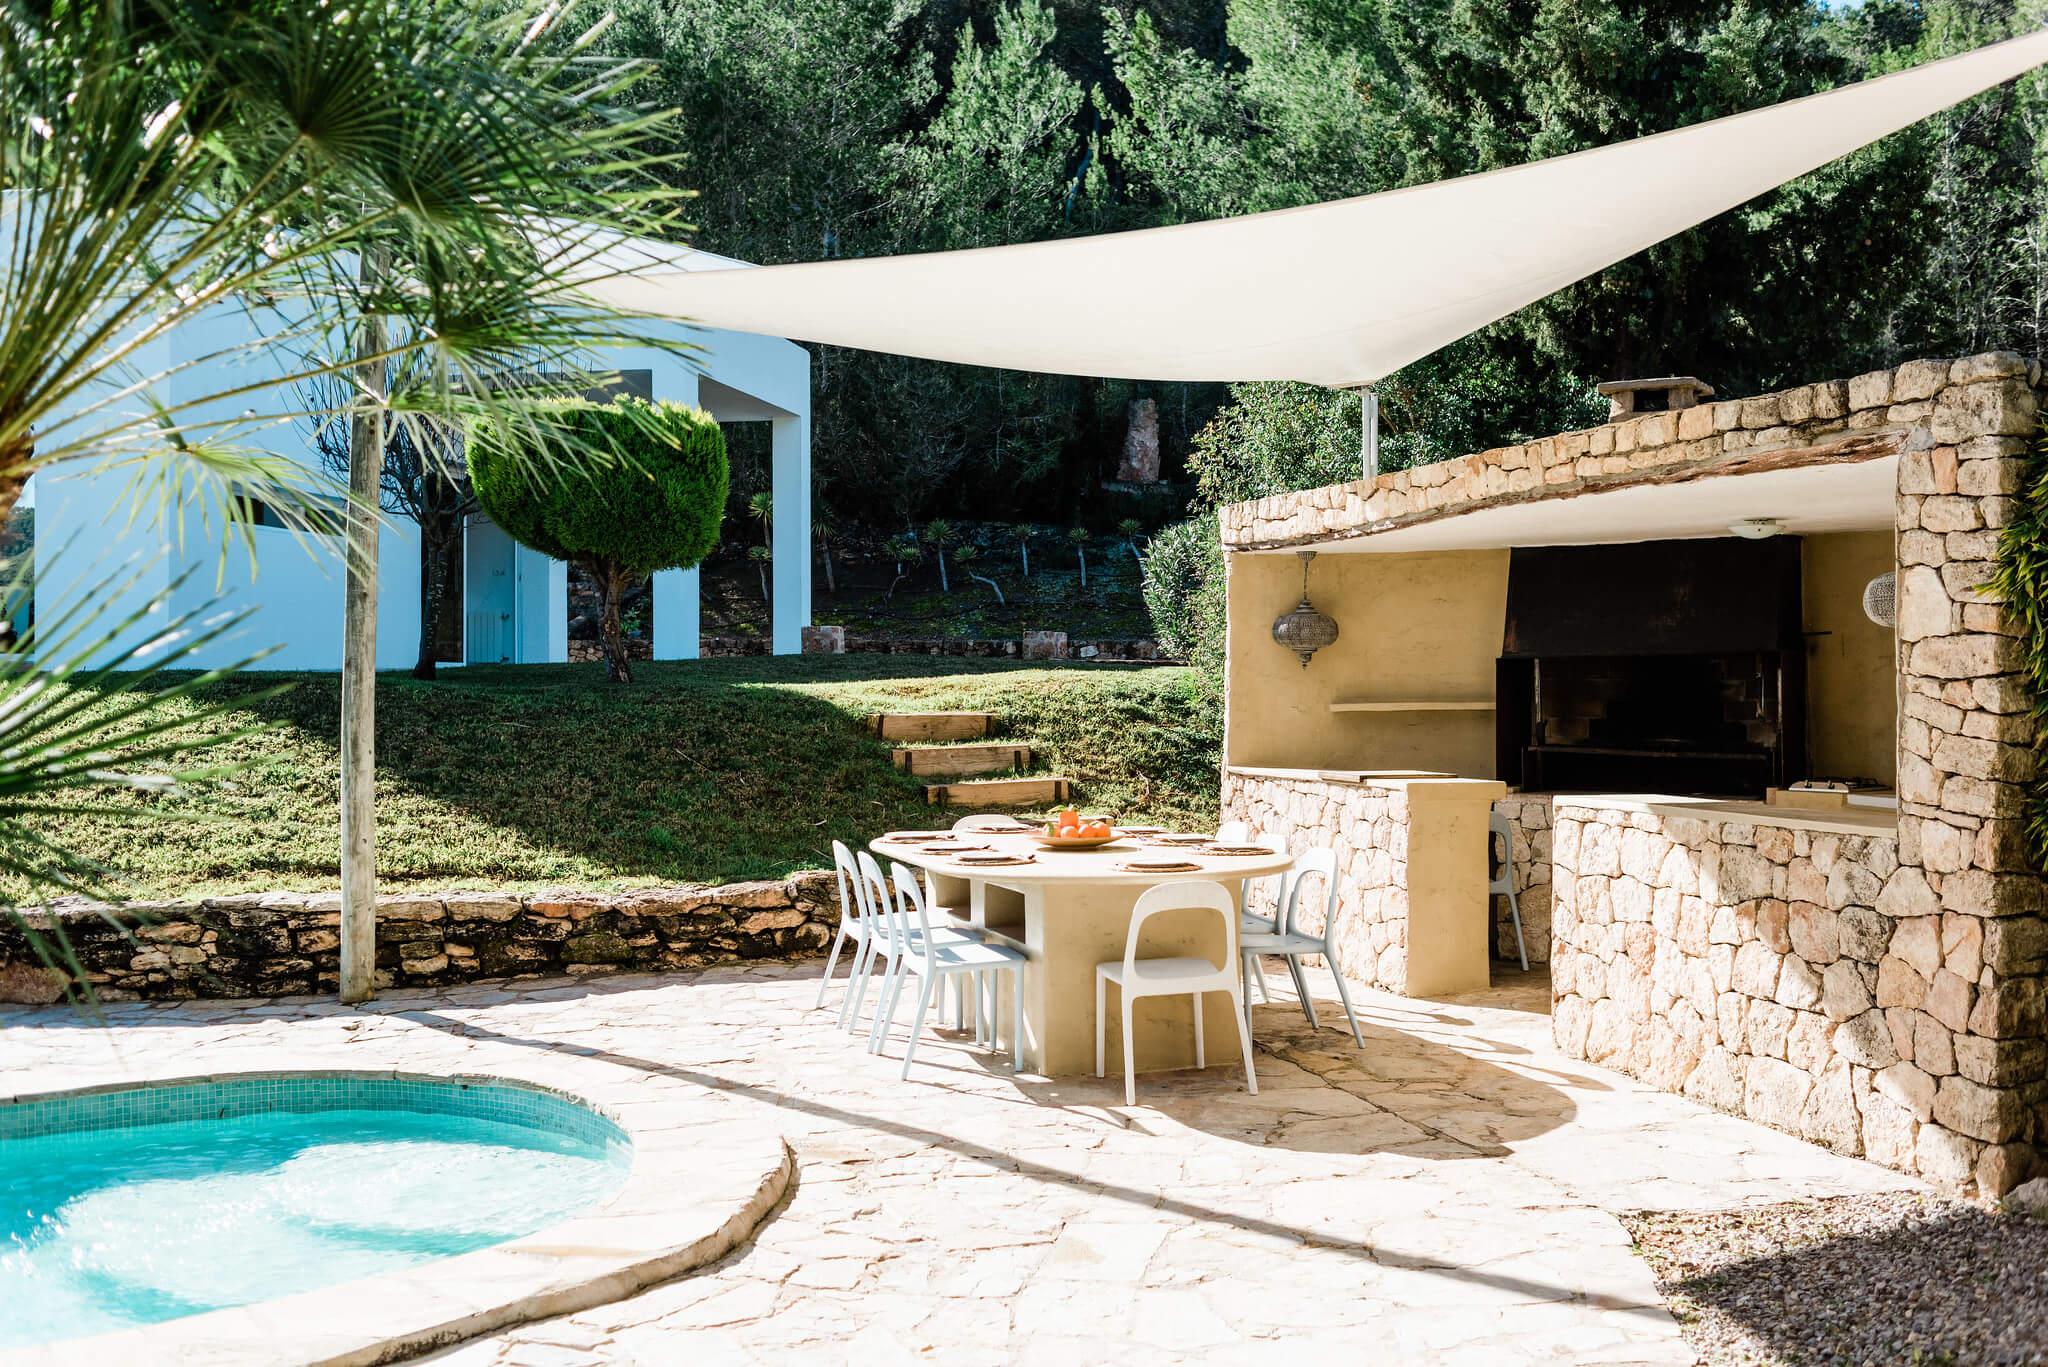 https://www.white-ibiza.com/wp-content/uploads/2020/05/white-ibiza-villas-can-verde-exterior-outside-kitchen.jpg